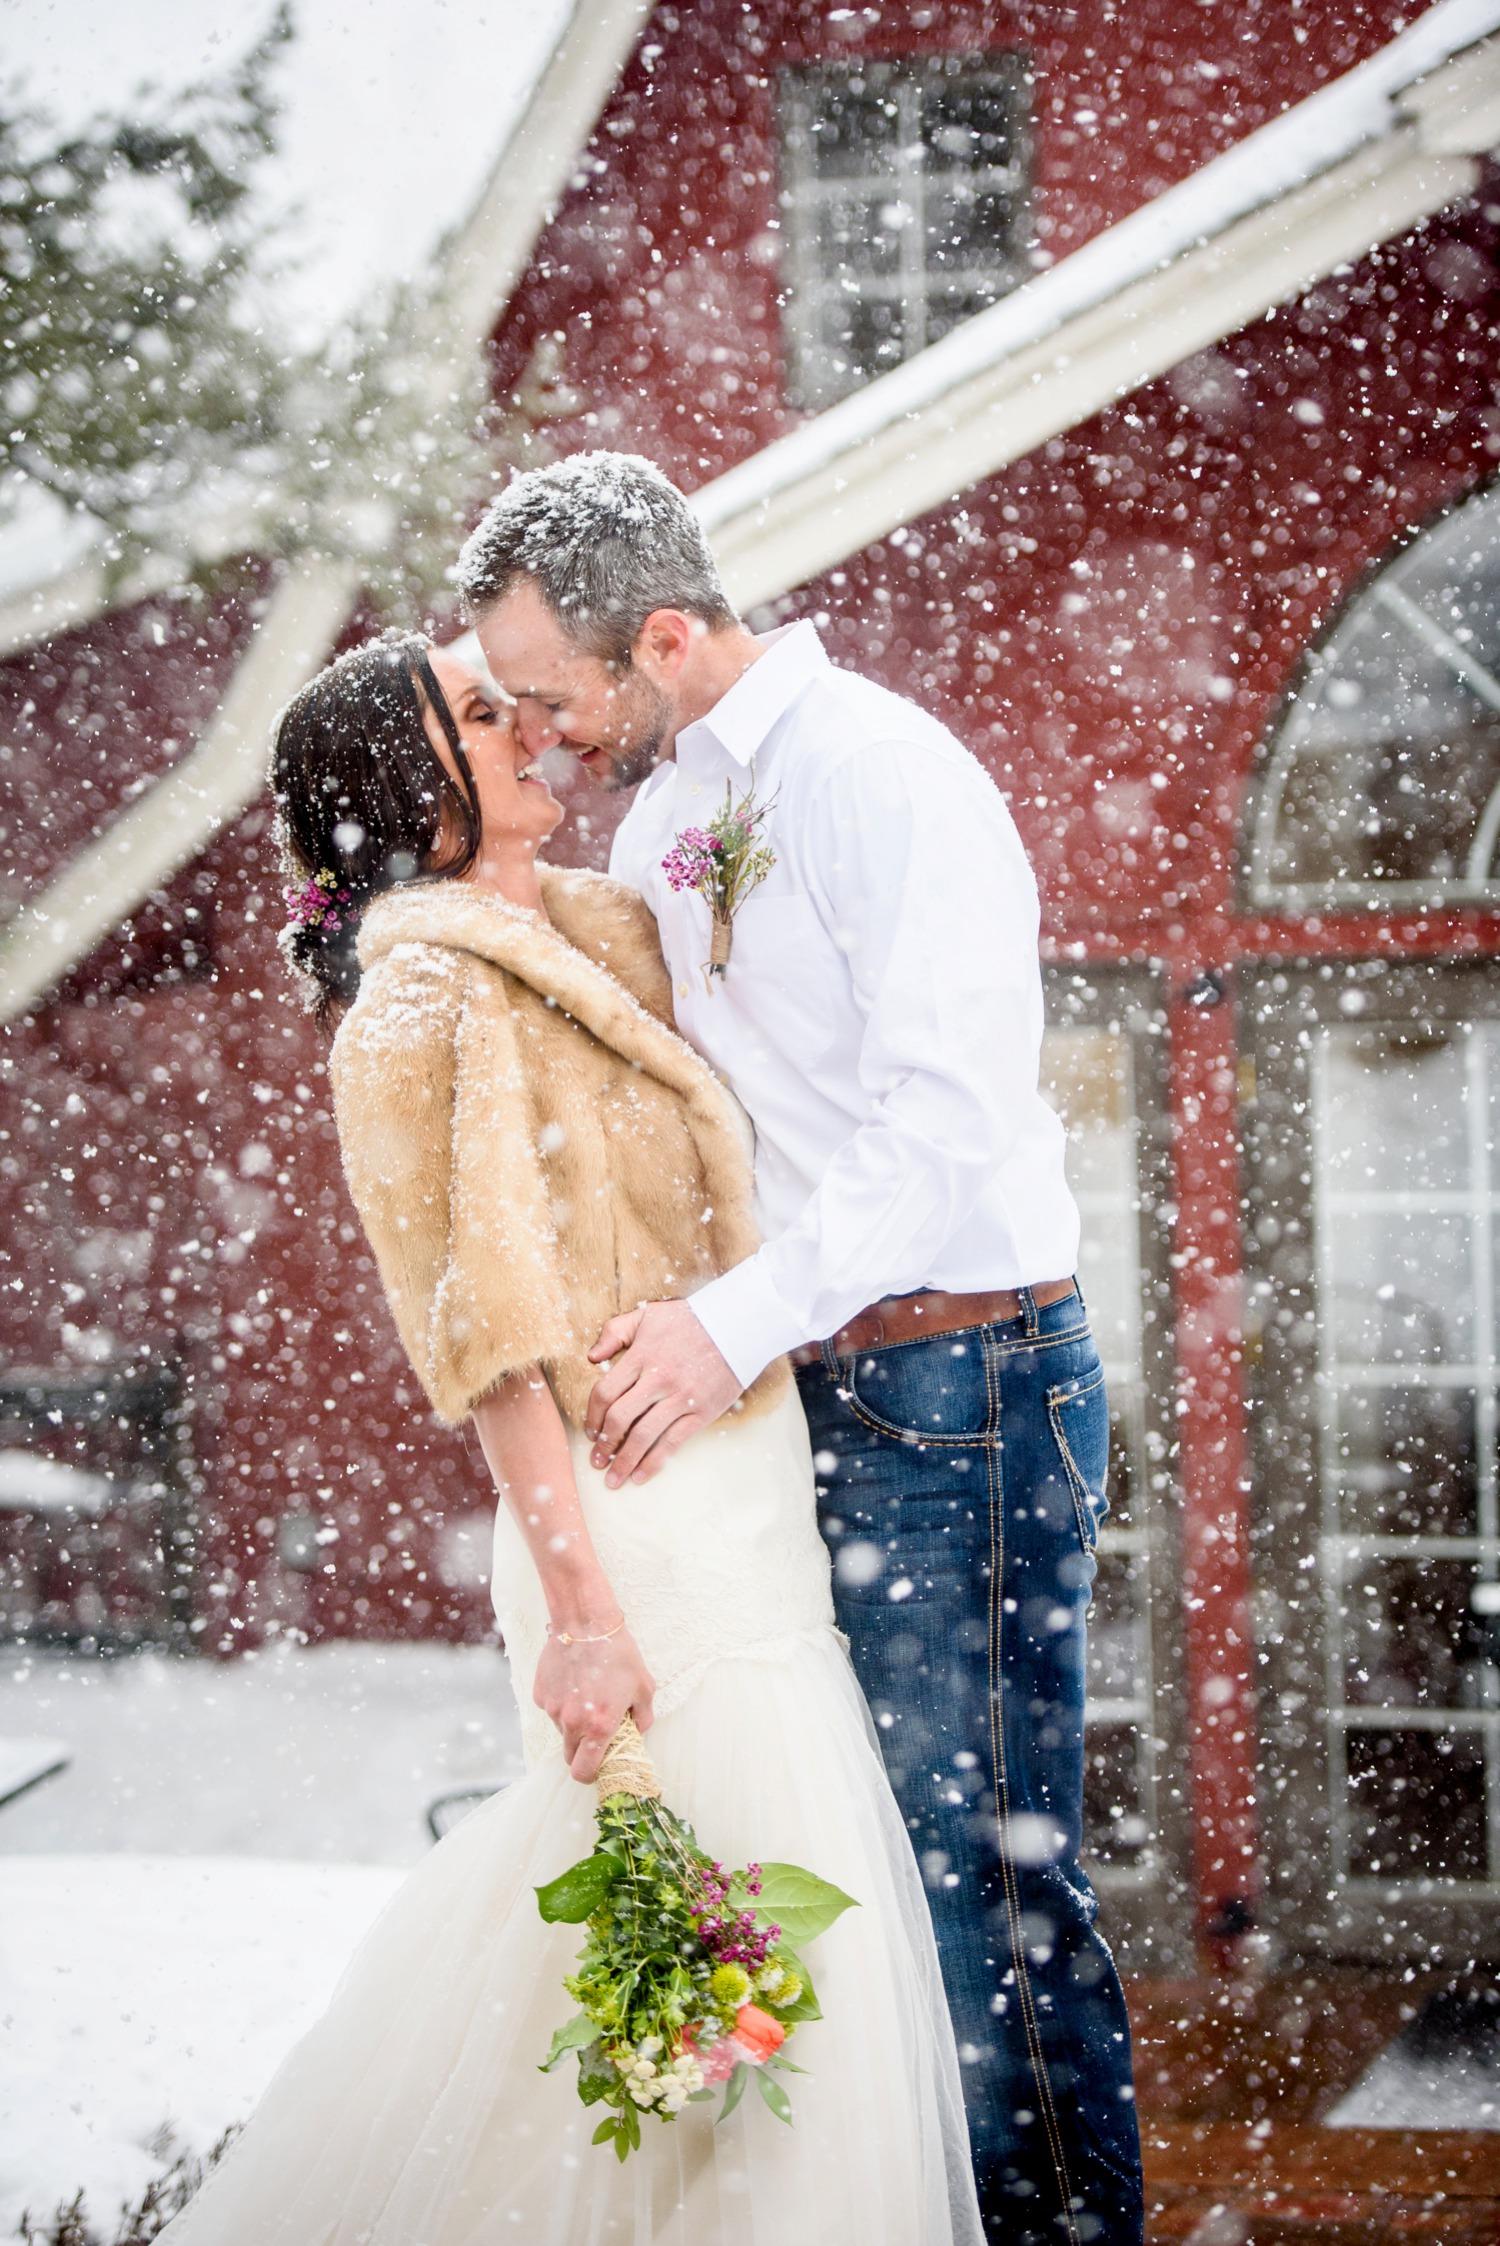 Evergreen-mountain-winter-wedding-photography_0022.jpg